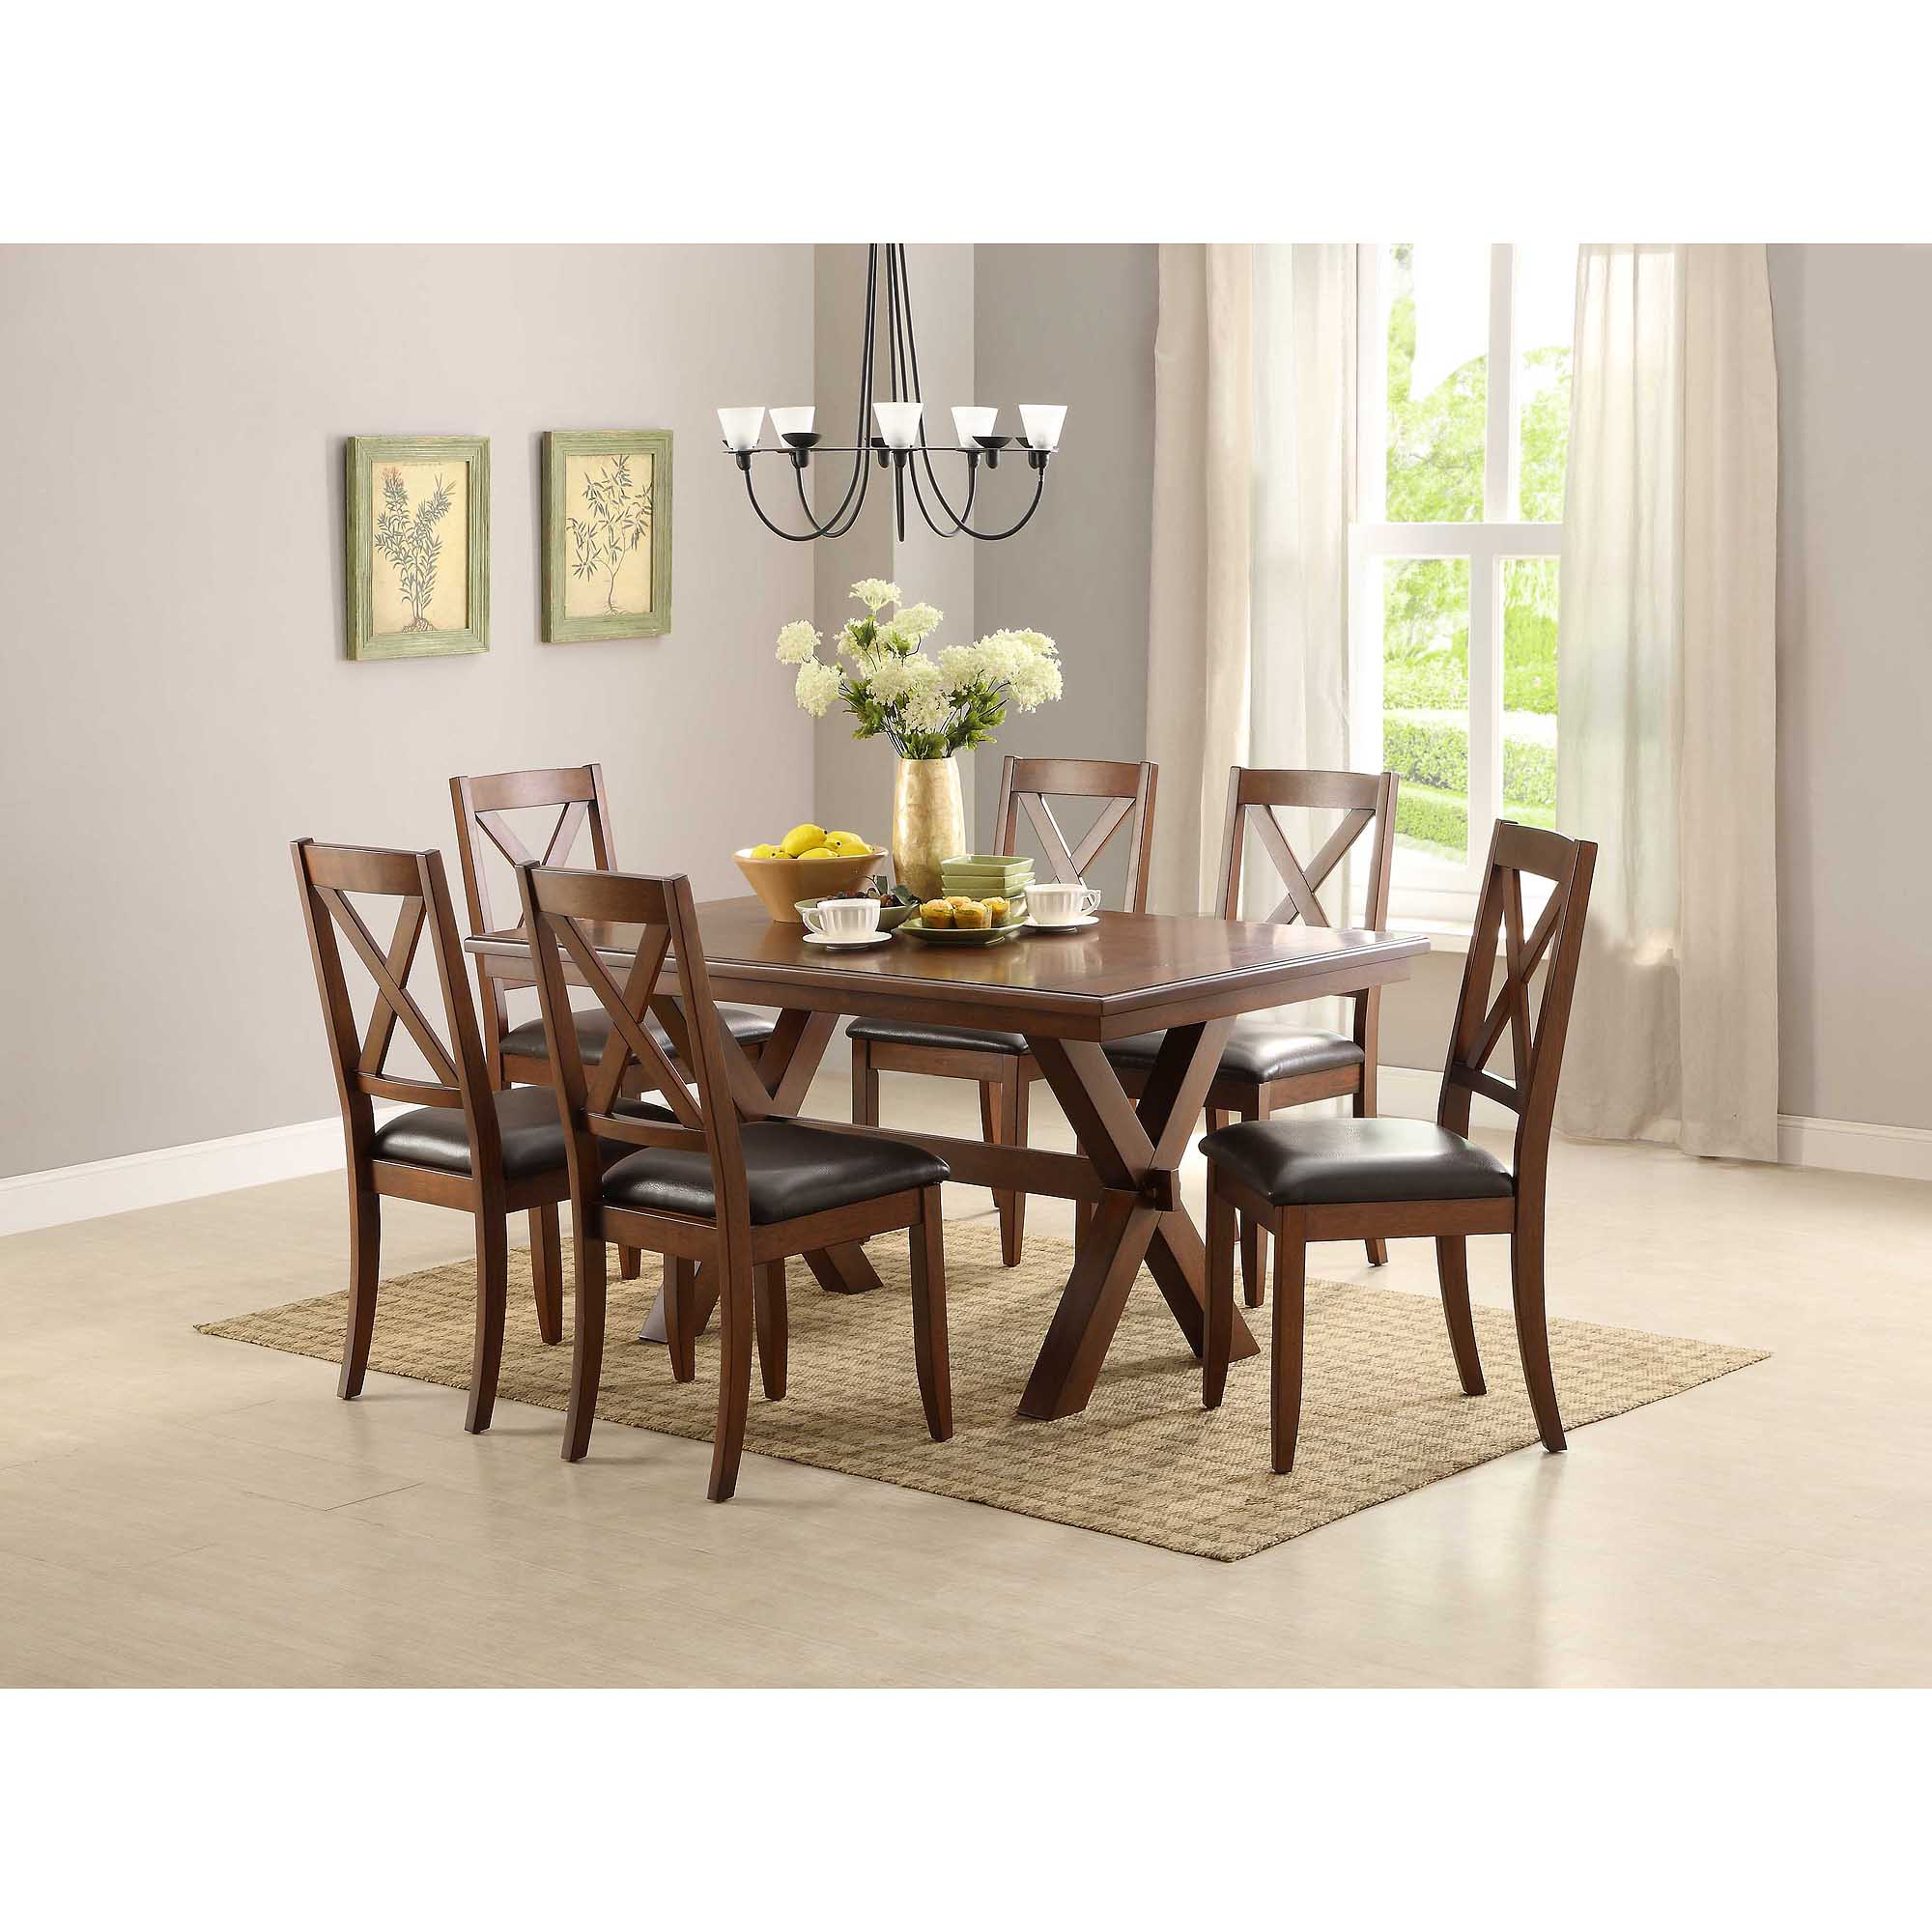 2 chair dining set wheelchair zipline better homes gardens maddox crossing of brown walmart com